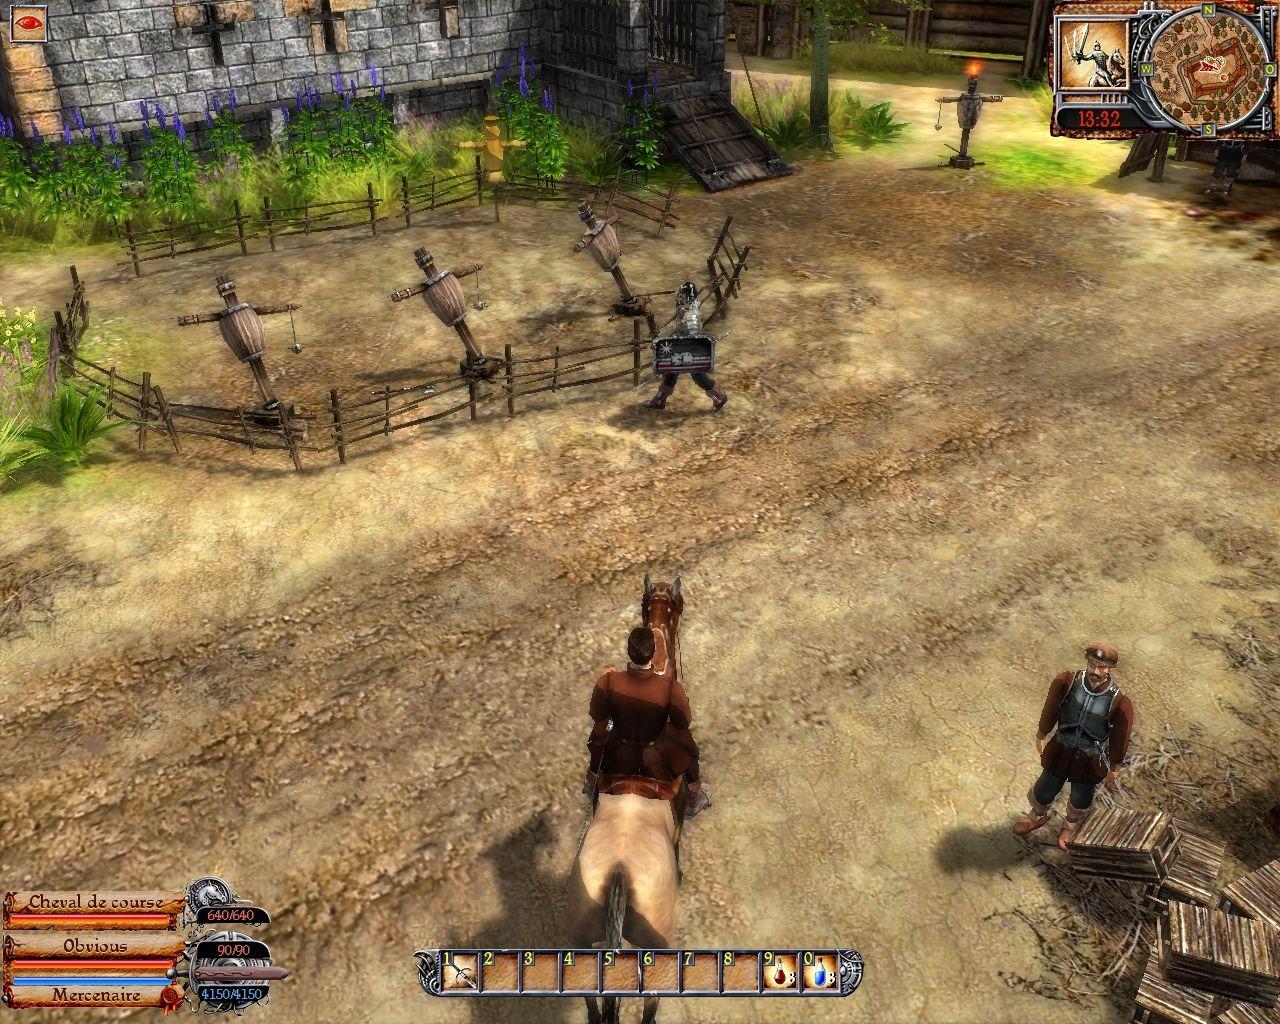 Free download program game pc basara highly compressed for Leben vereinfachen